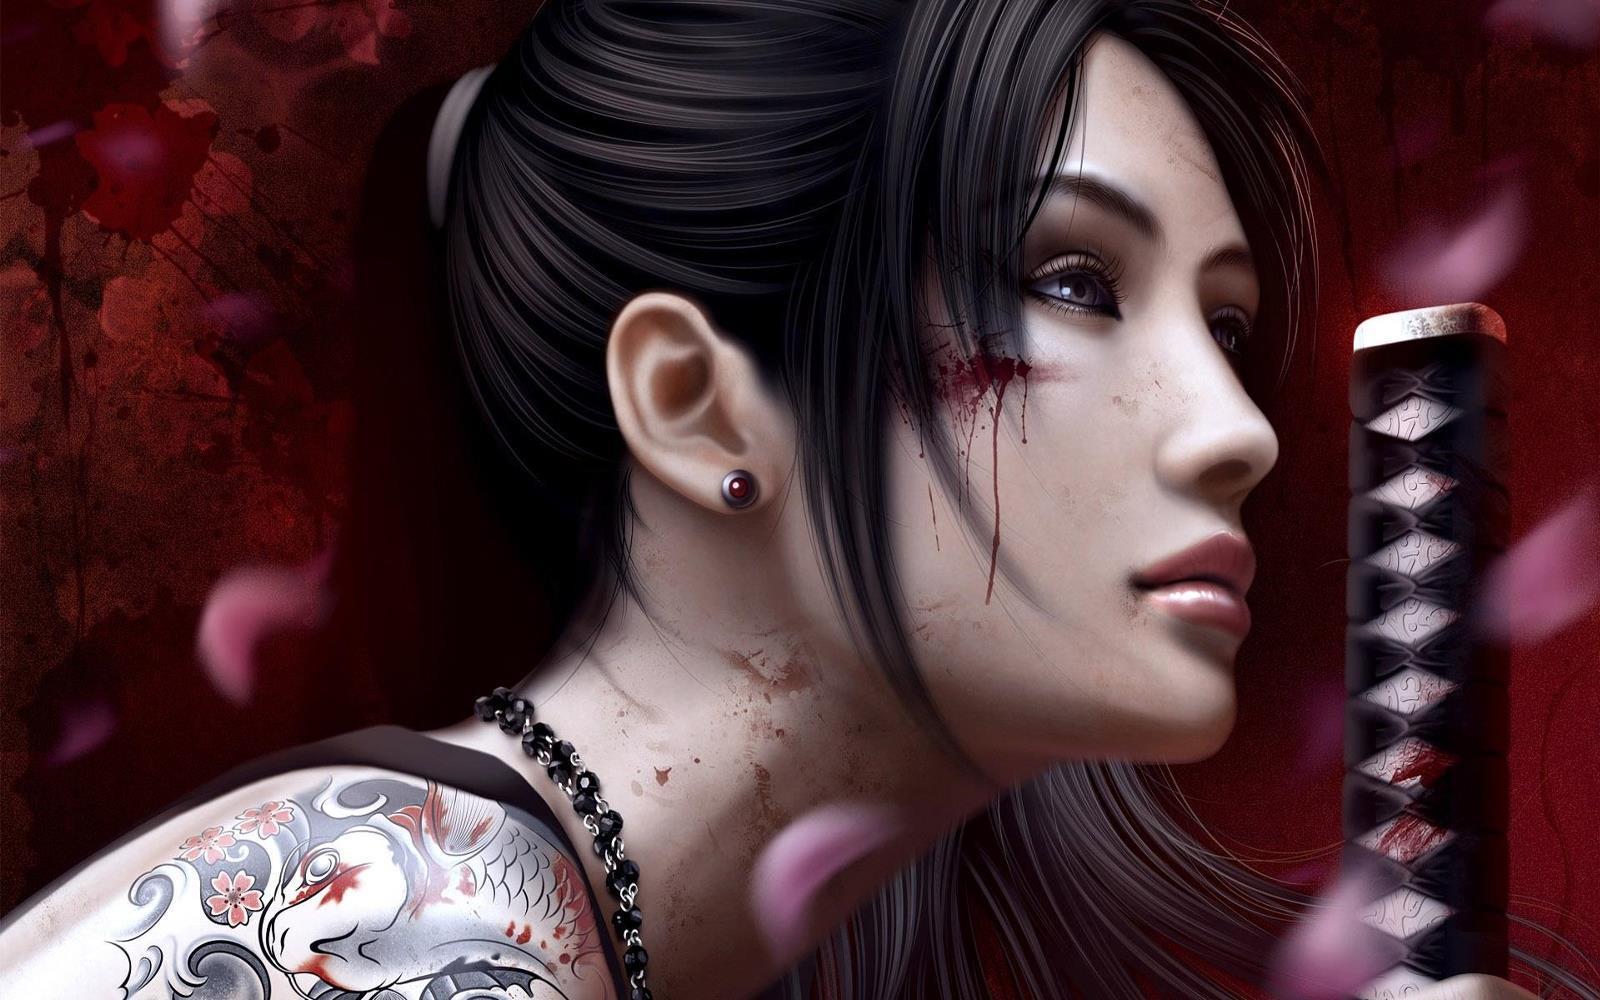 Free Download Cran Hdfemmes Tatouesgirl Tatto Femme Tatouee